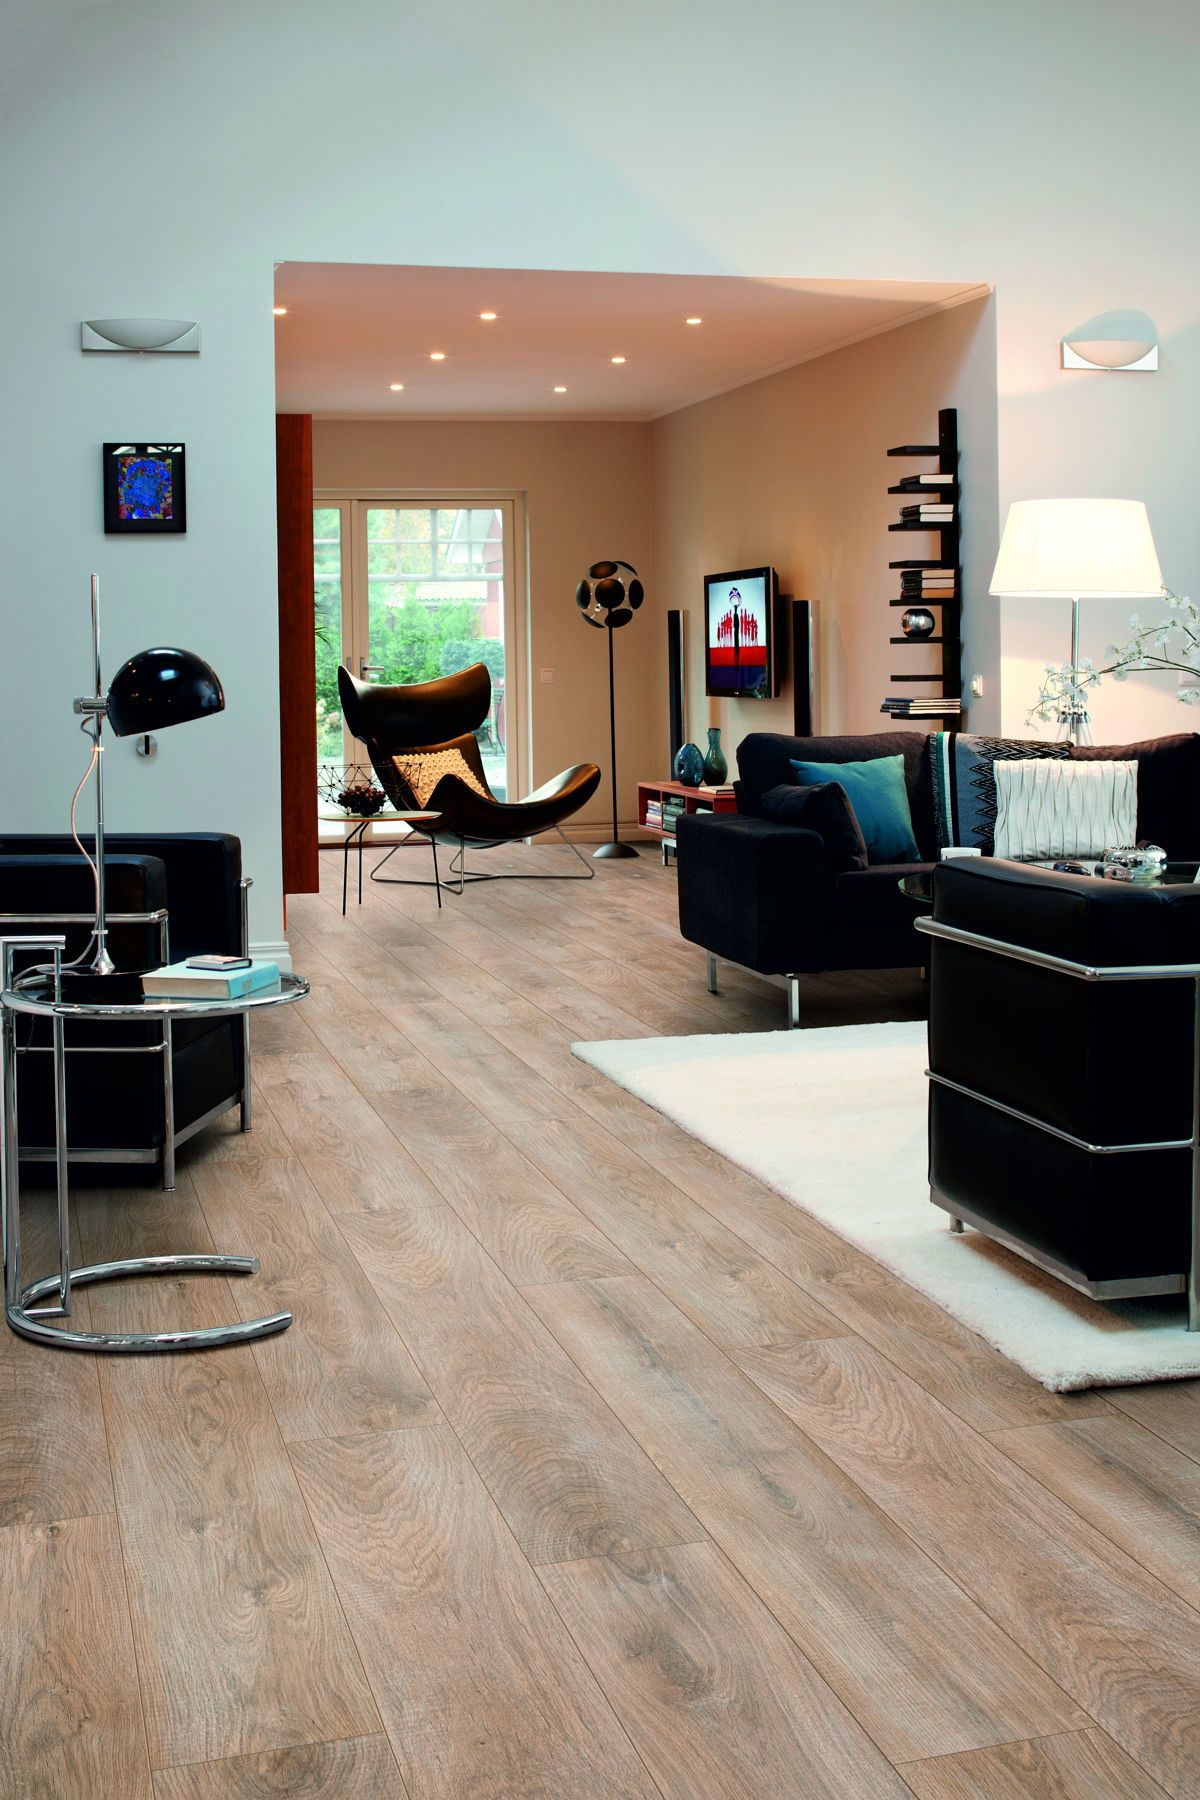 all inspirational blonde refinishing vancouver first floor hardwood of maple greater floors grade